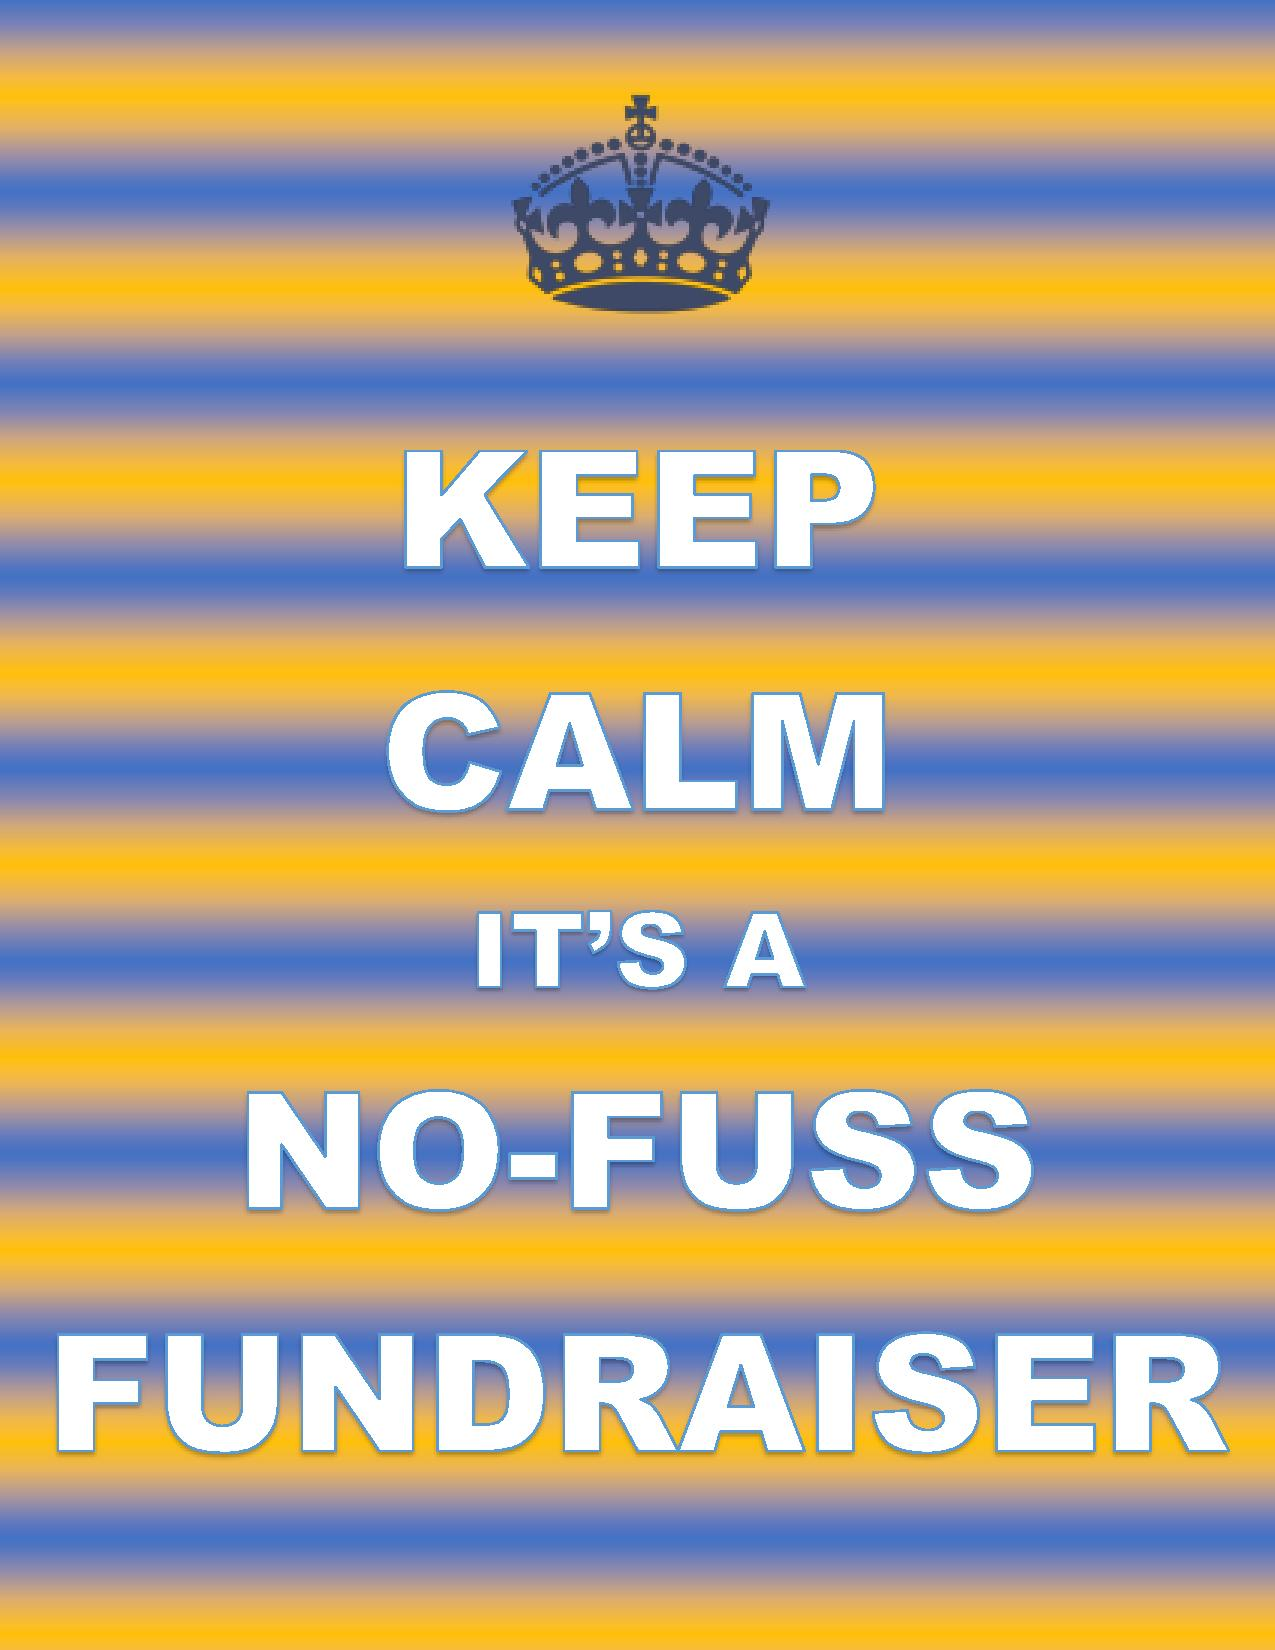 No-Fuss Fundraiser (Blue and Gold).jpg